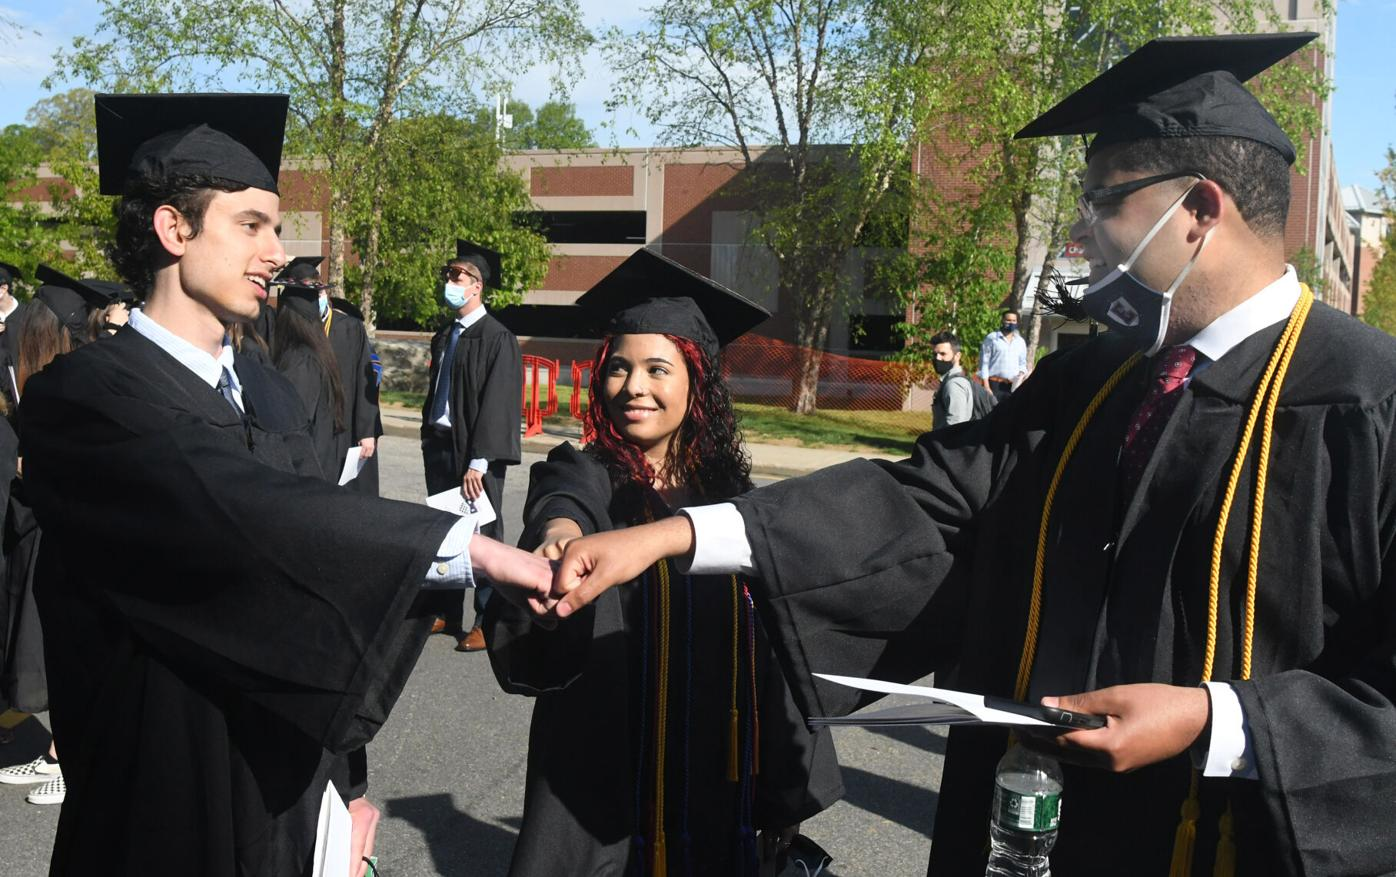 051521 Eastern State Graduation 05.jpg